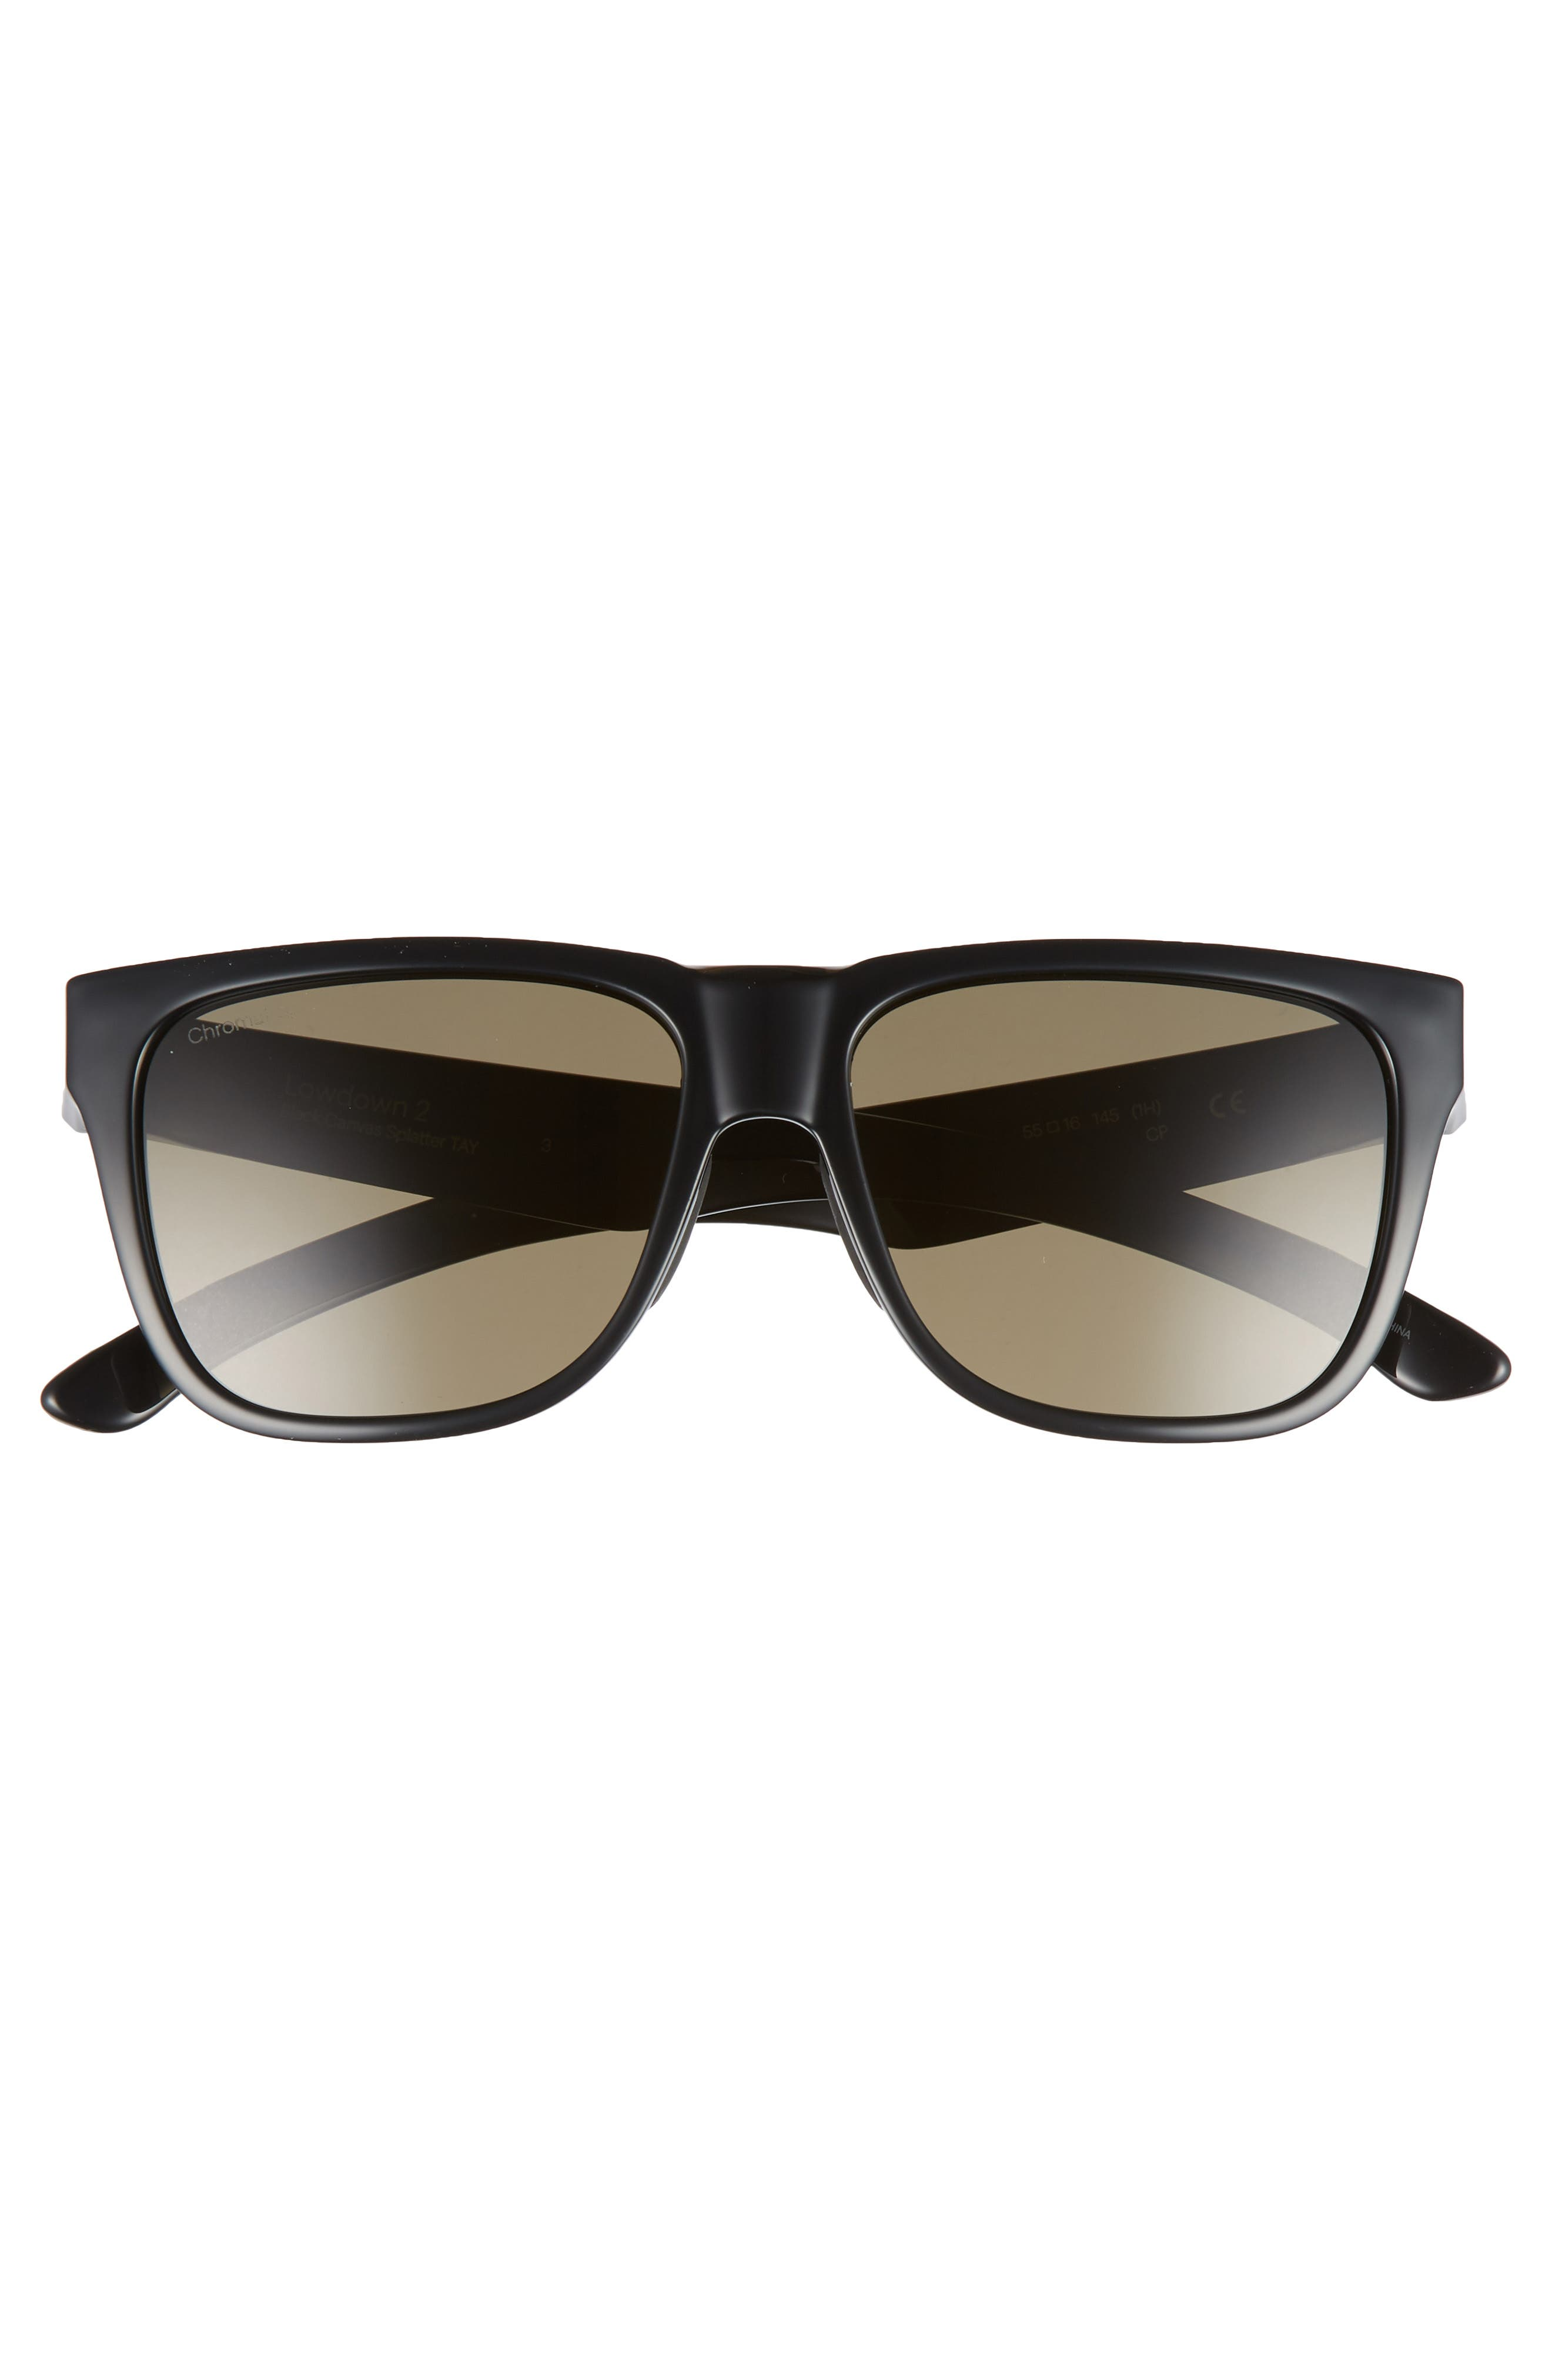 Outlier 2 57mm ChromaPop<sup>™</sup> Sunglasses,                             Alternate thumbnail 2, color,                             MATTE BLACK/ GREY GREEN